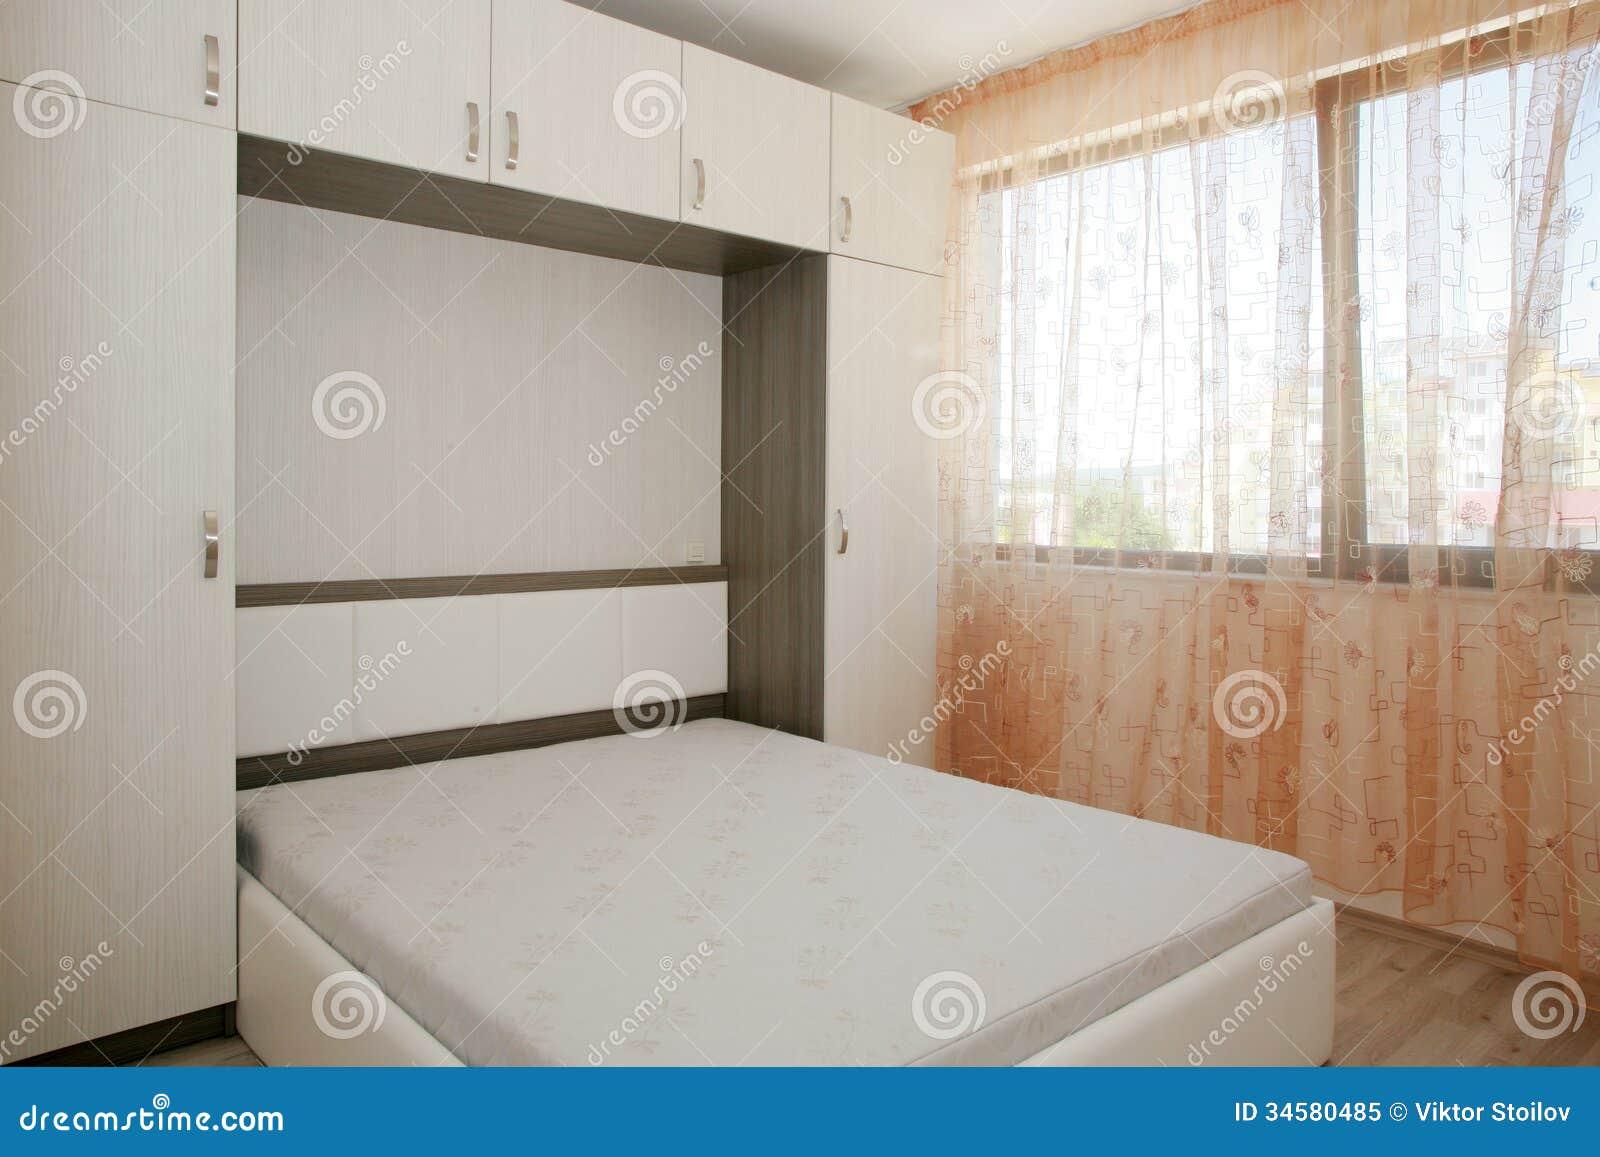 Bedroom Royalty Free Stock Photo - Image: 34580485 - Small Bedroom With Wardrobe